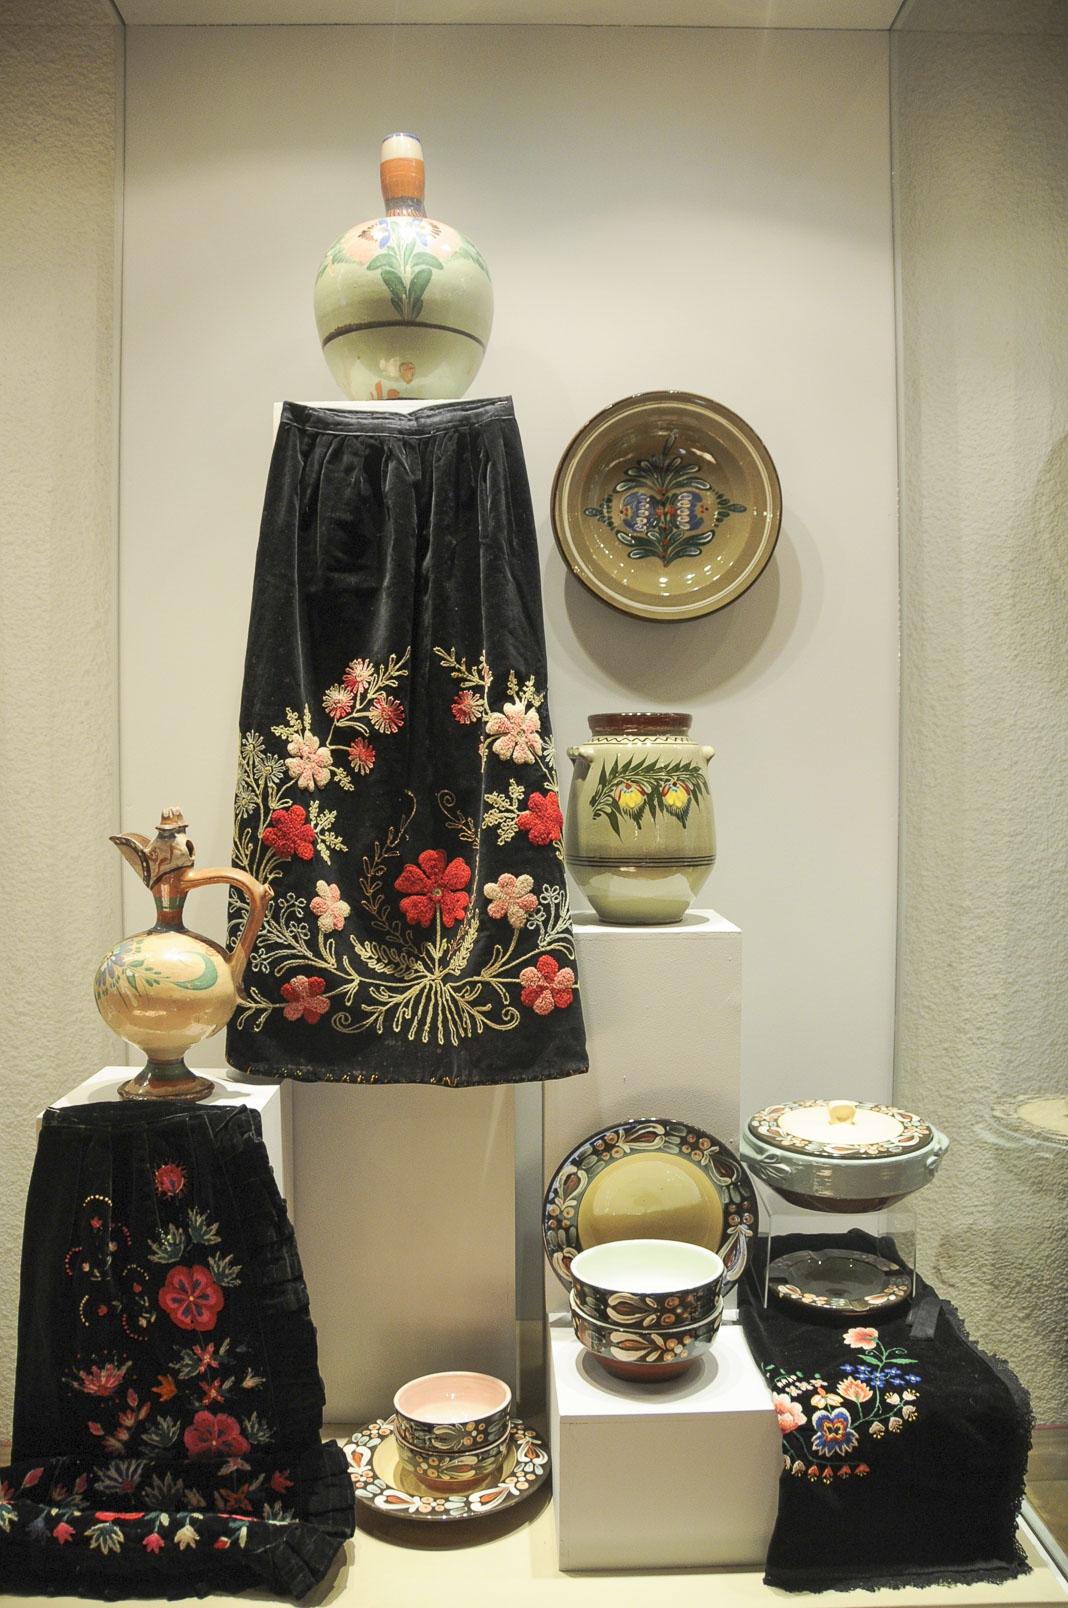 troyan-museum-cvetqta-na-zografa-18